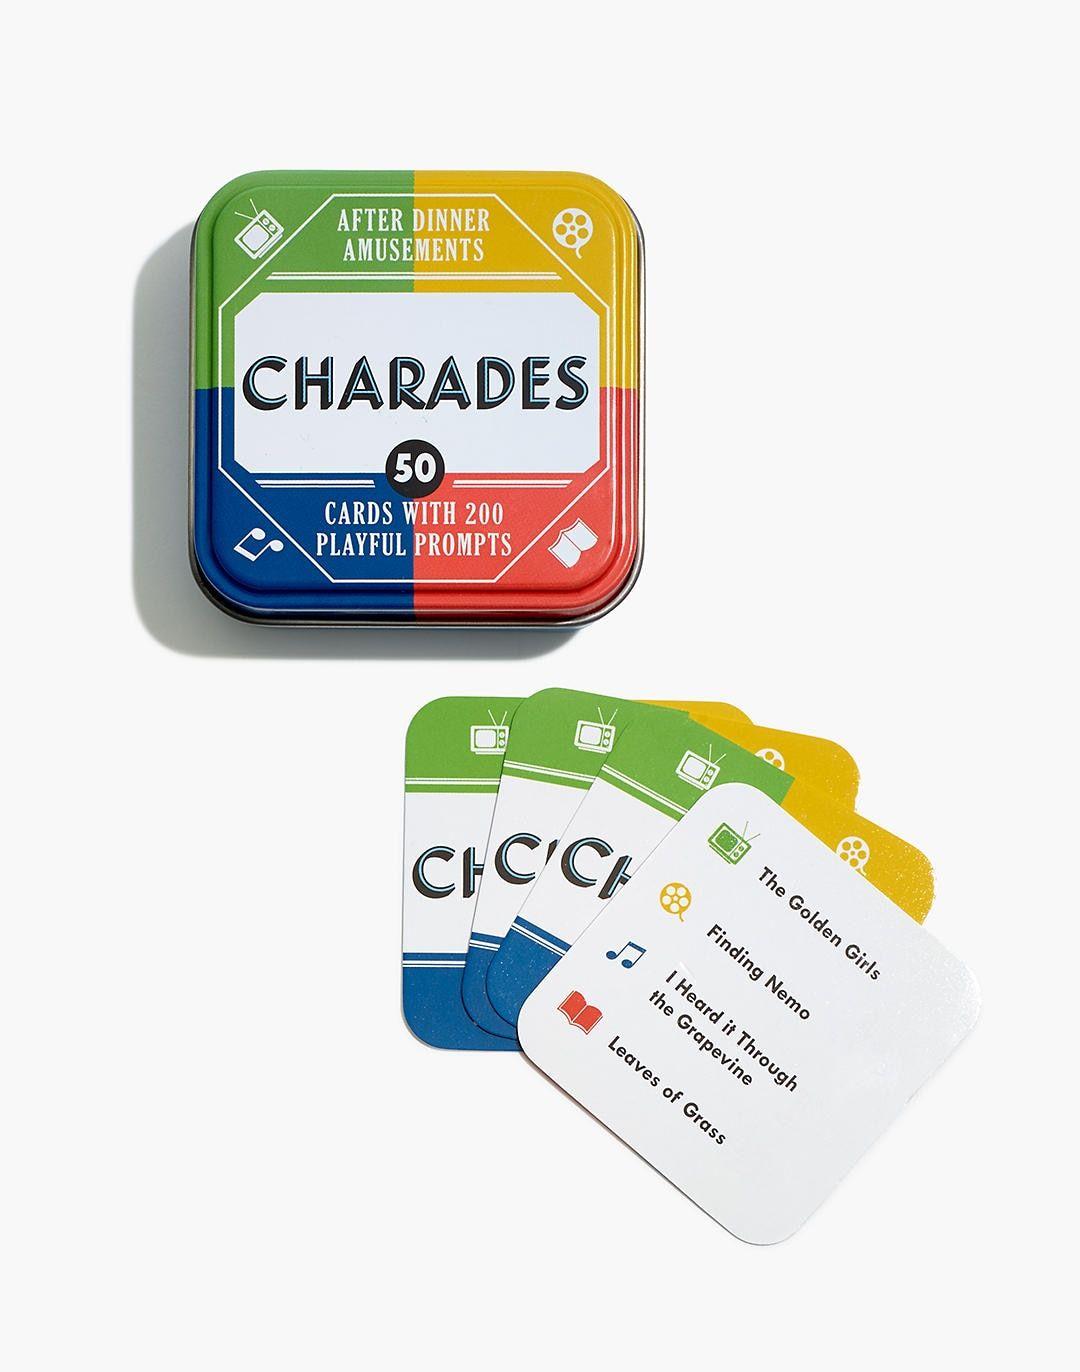 Charades Card Game Charades cards, Card games, Charades